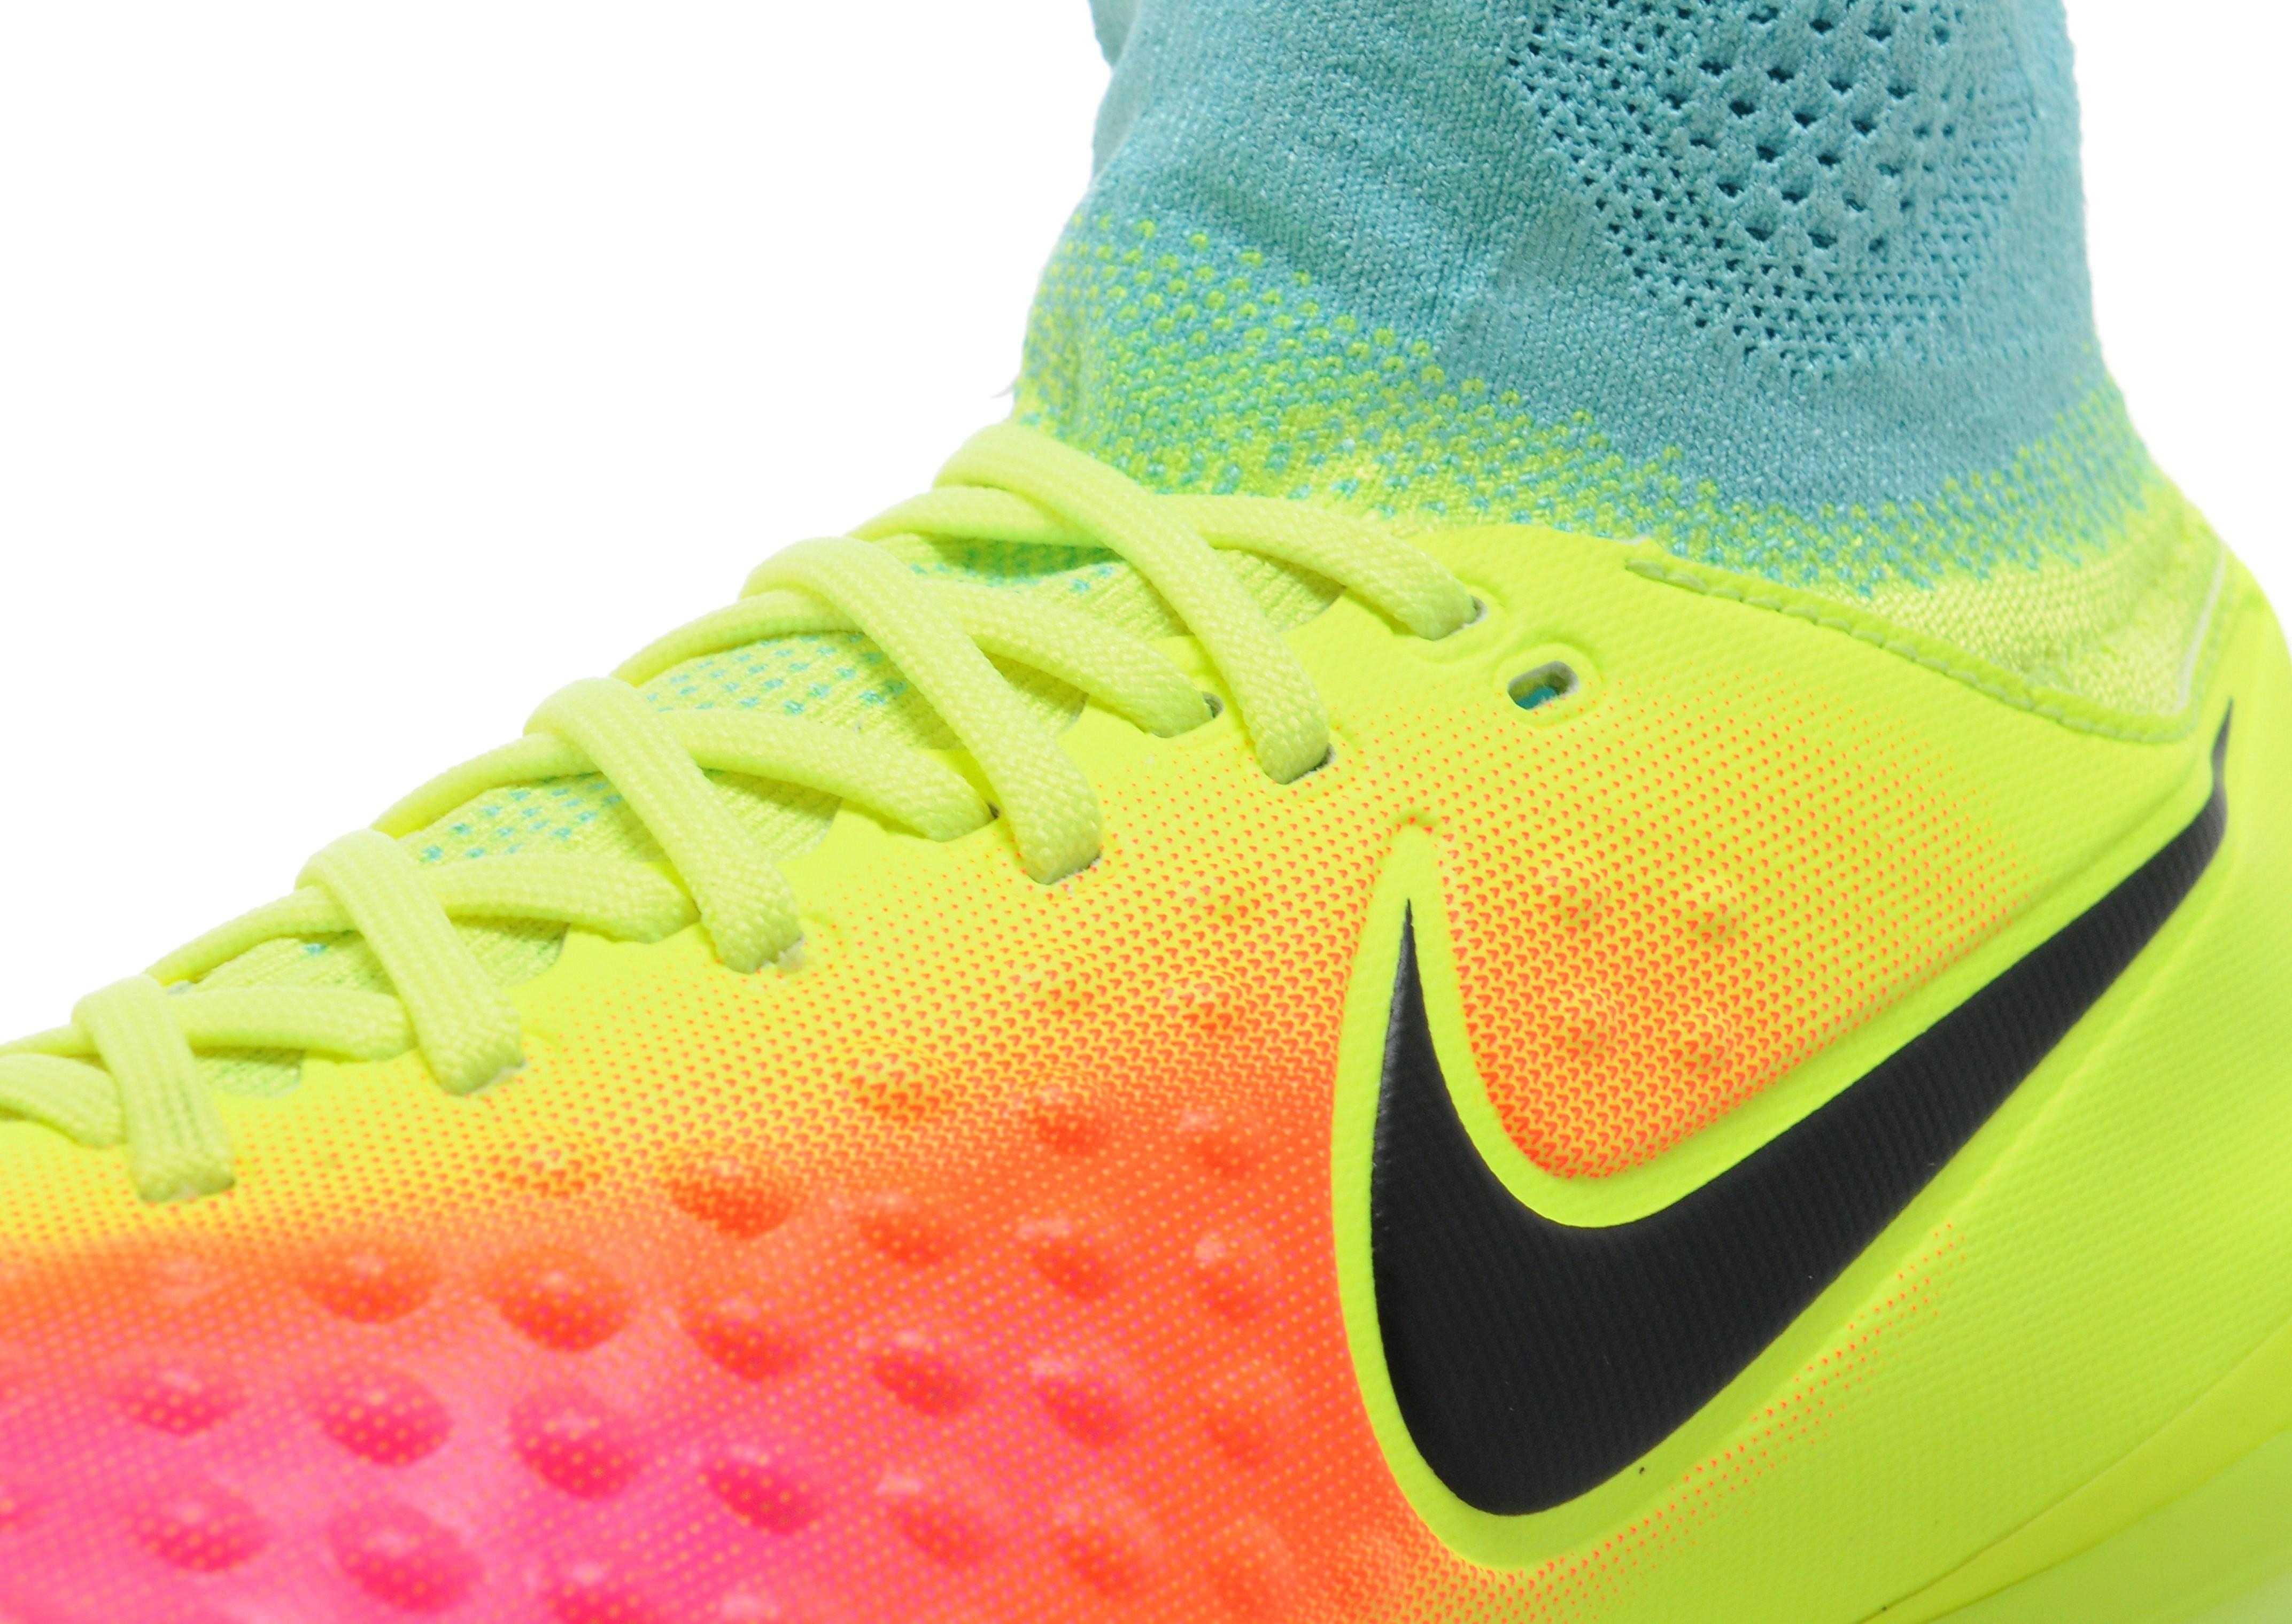 Nike Magista Obra II Firm Ground Junior